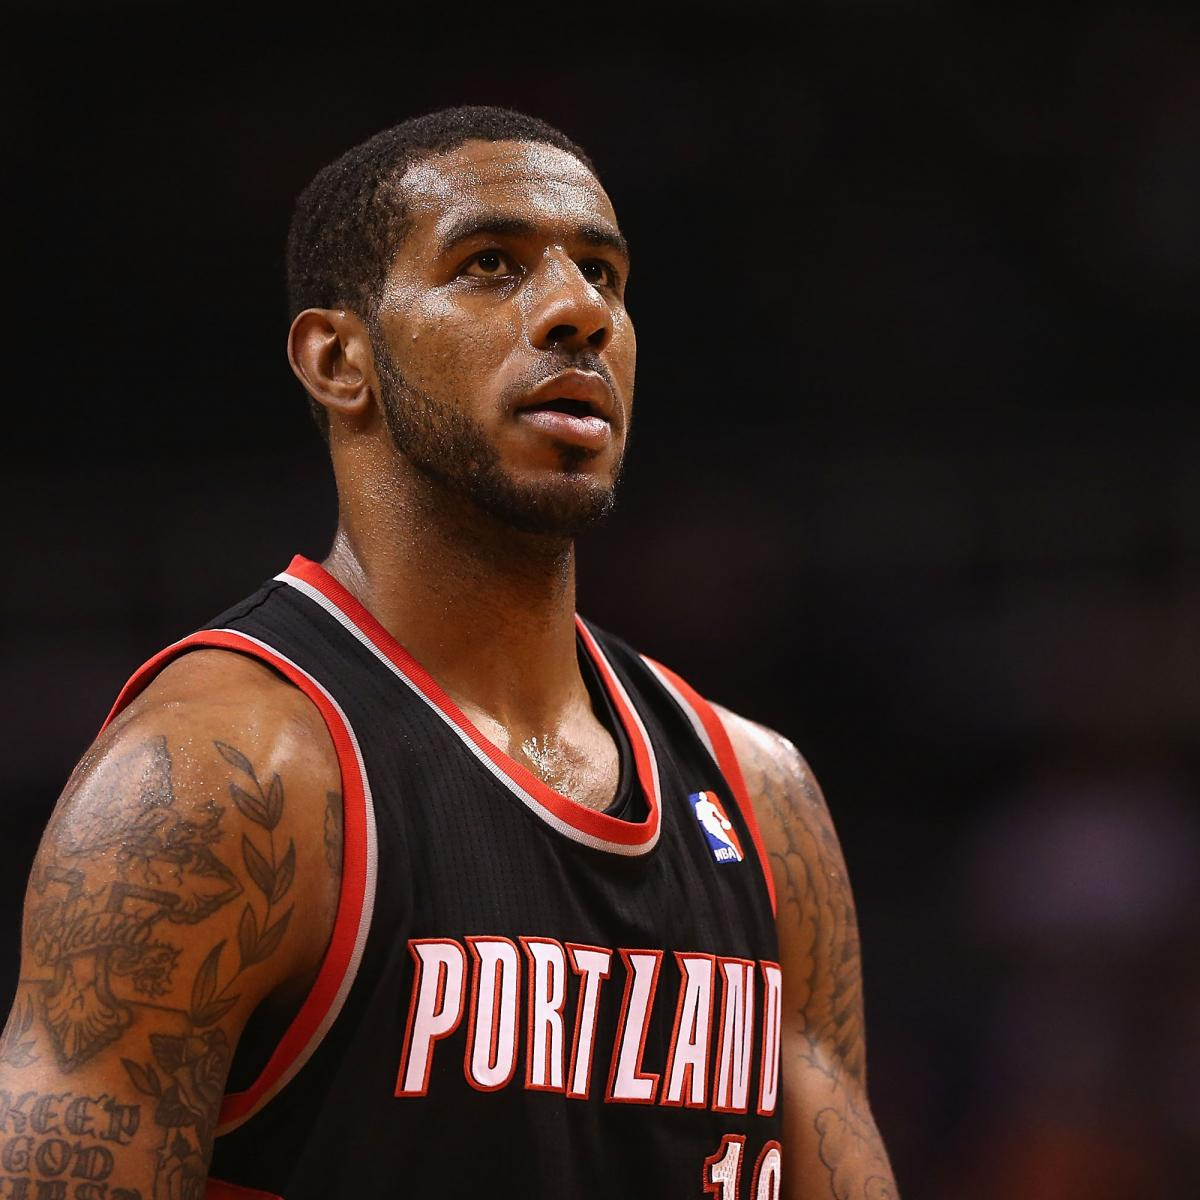 Portland Trail Blazers Injury News: LaMarcus Aldridge Injury: Updates On Blazers Star's Back